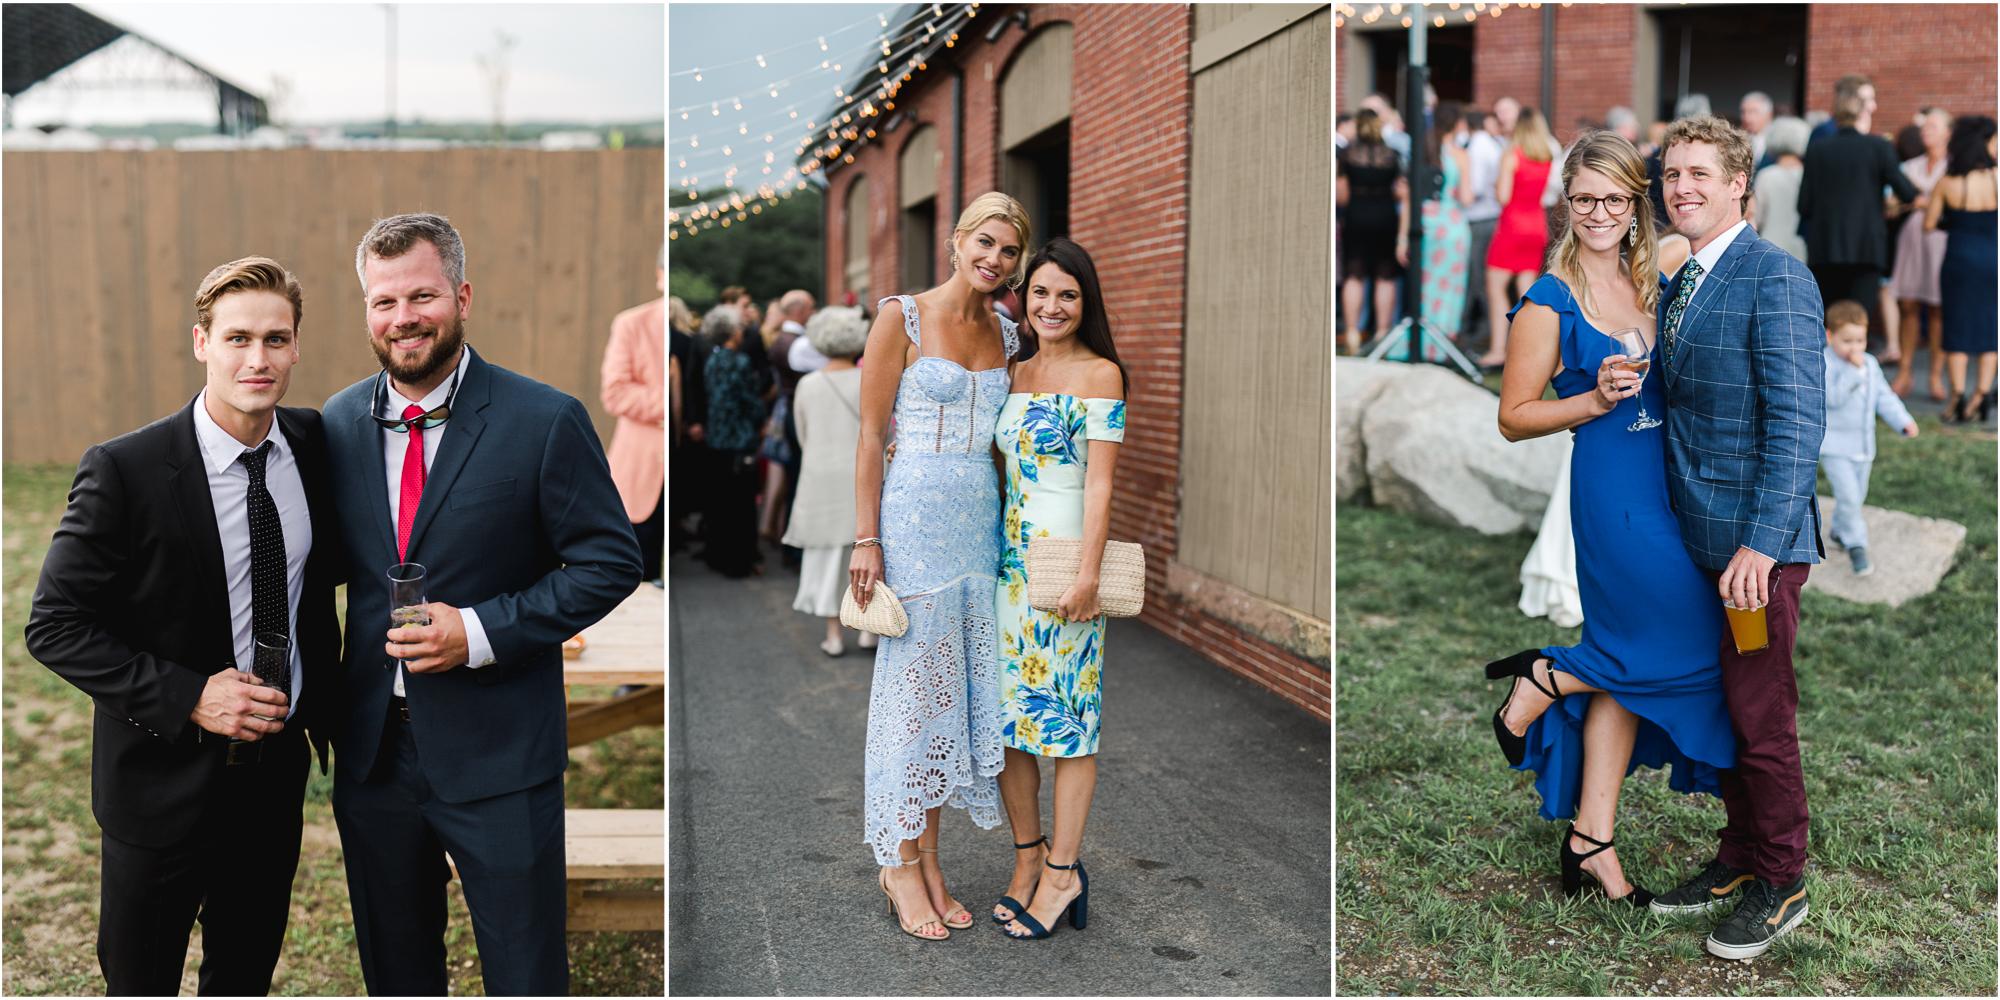 Portland, Maine Wedding at Brick South 33.jpg